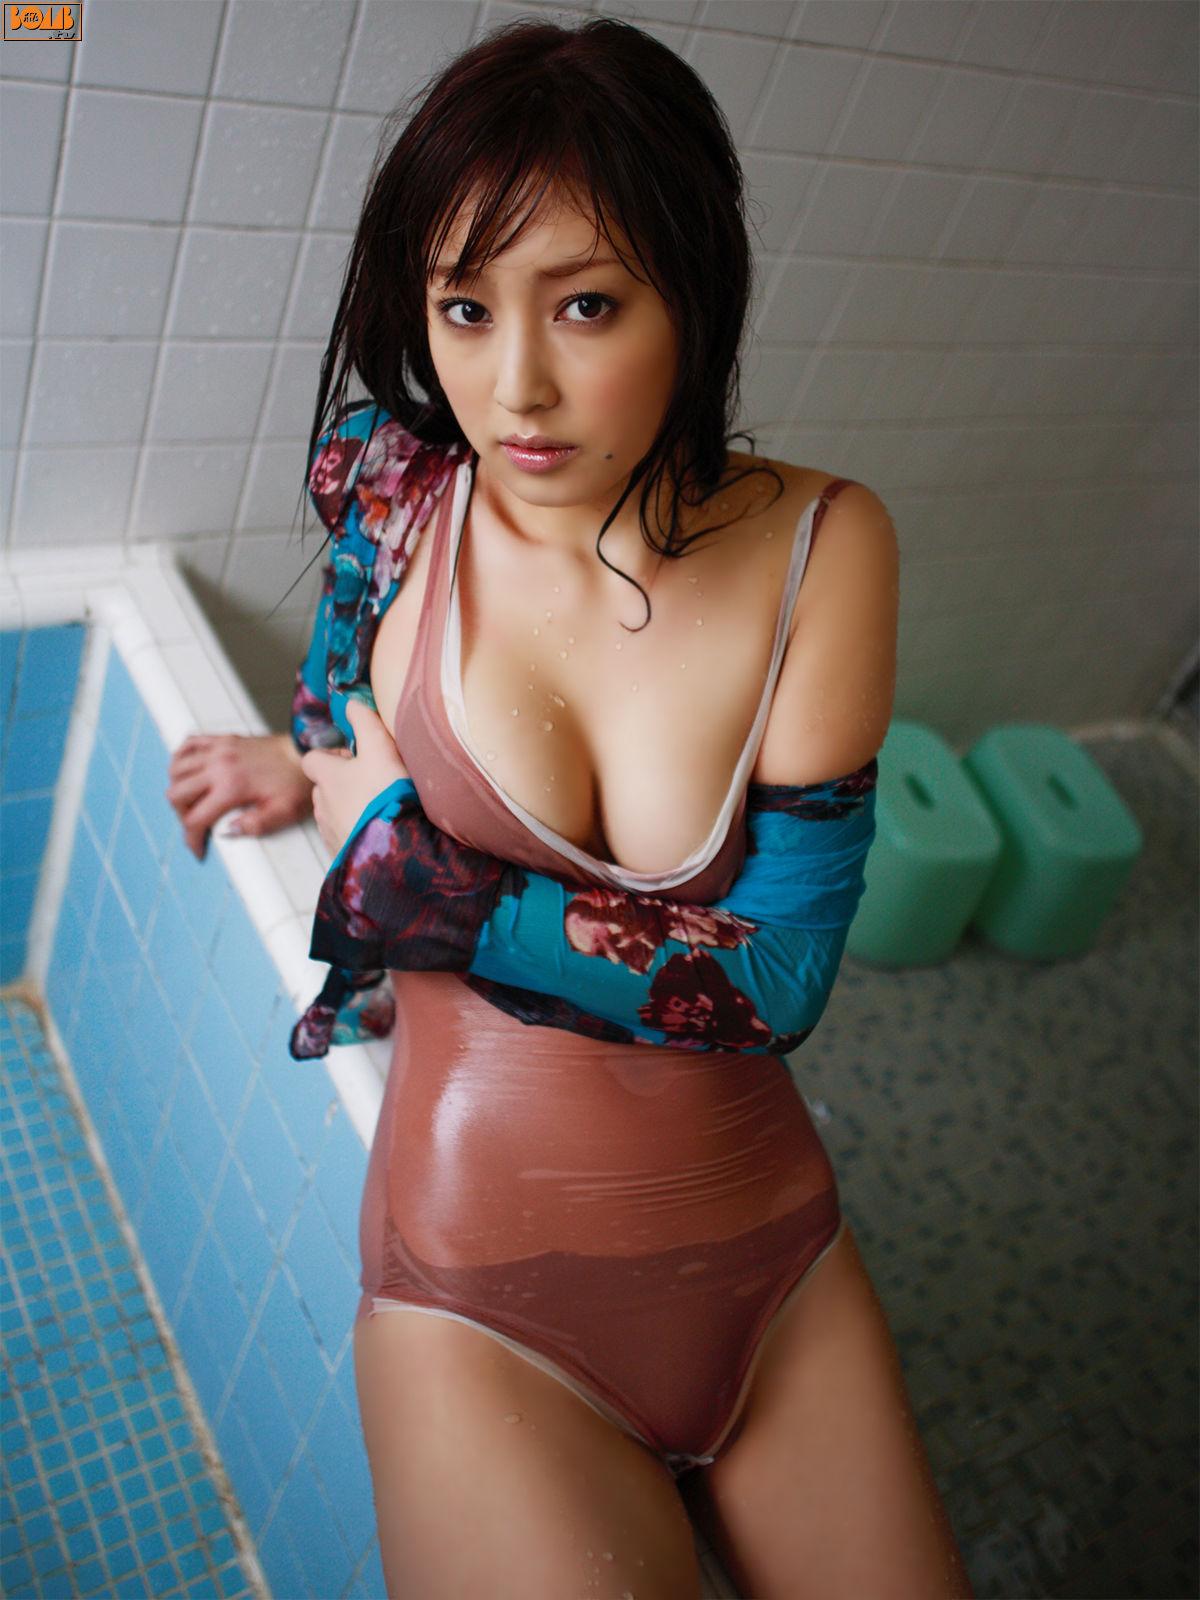 [Bomb.TV ] 池田夏希 Natsuki Ikeda 2009-03 - 亞洲美女 -